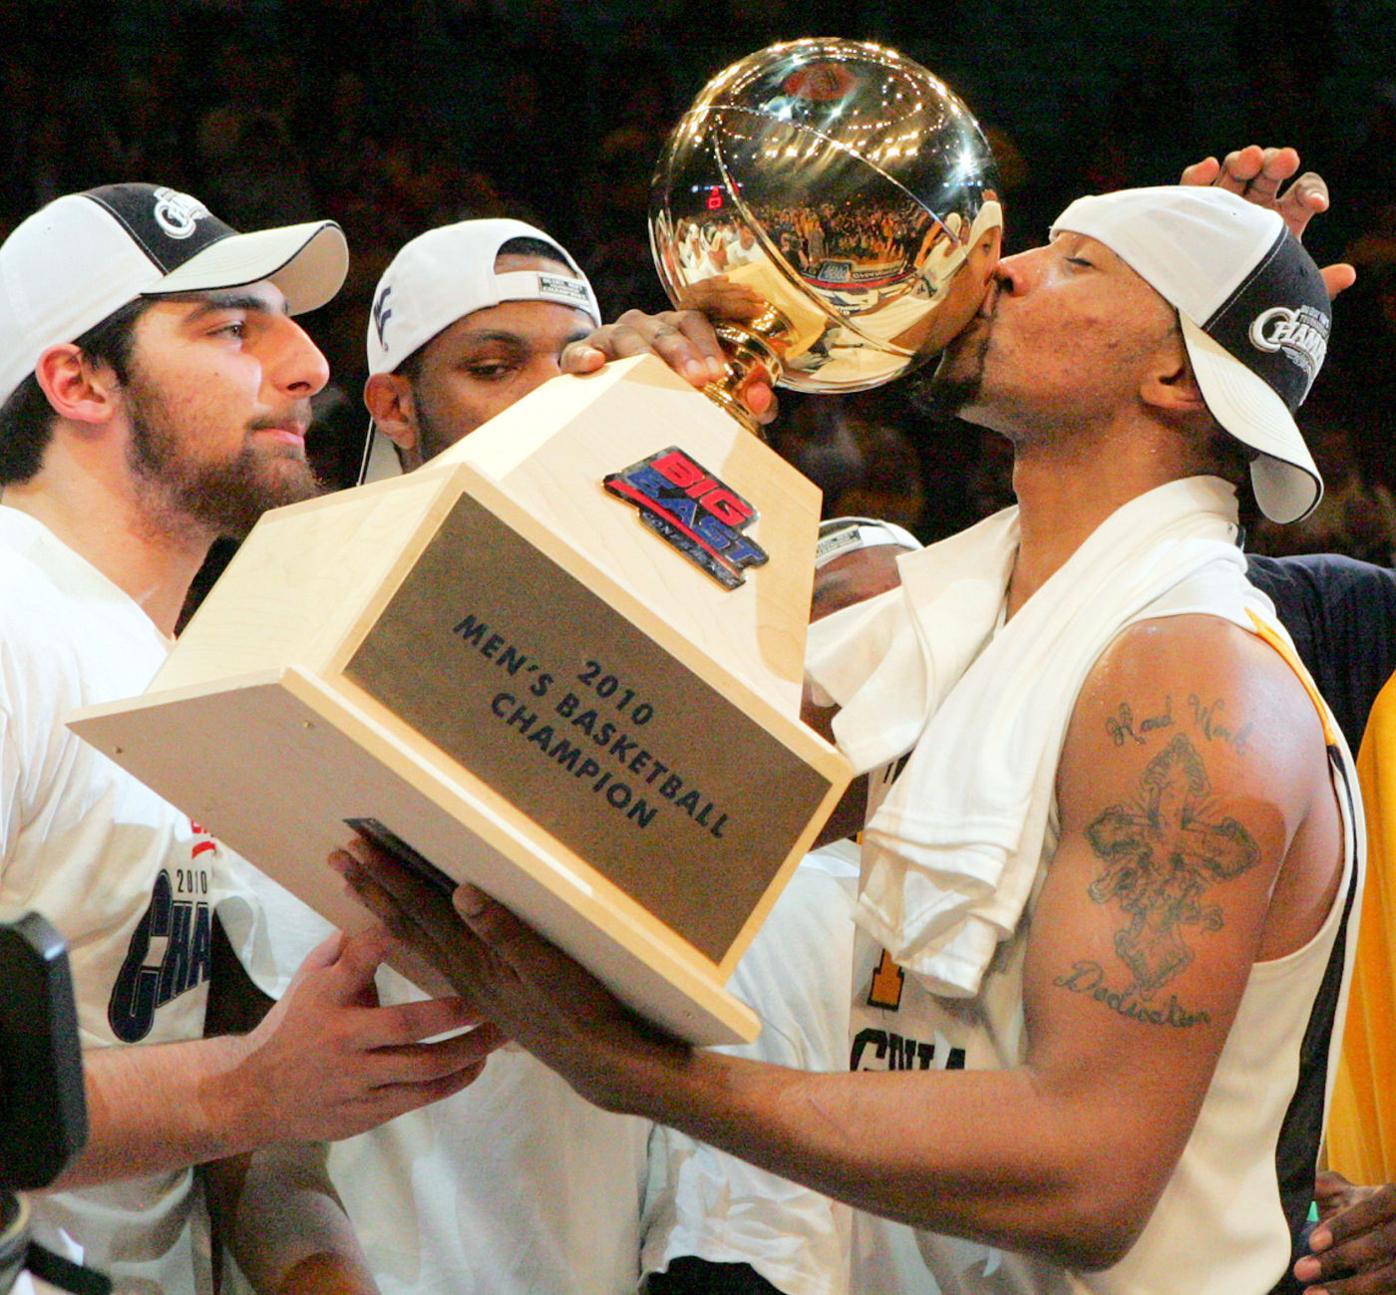 0320 GU Butler kiss trophy copy.jpg (copy)